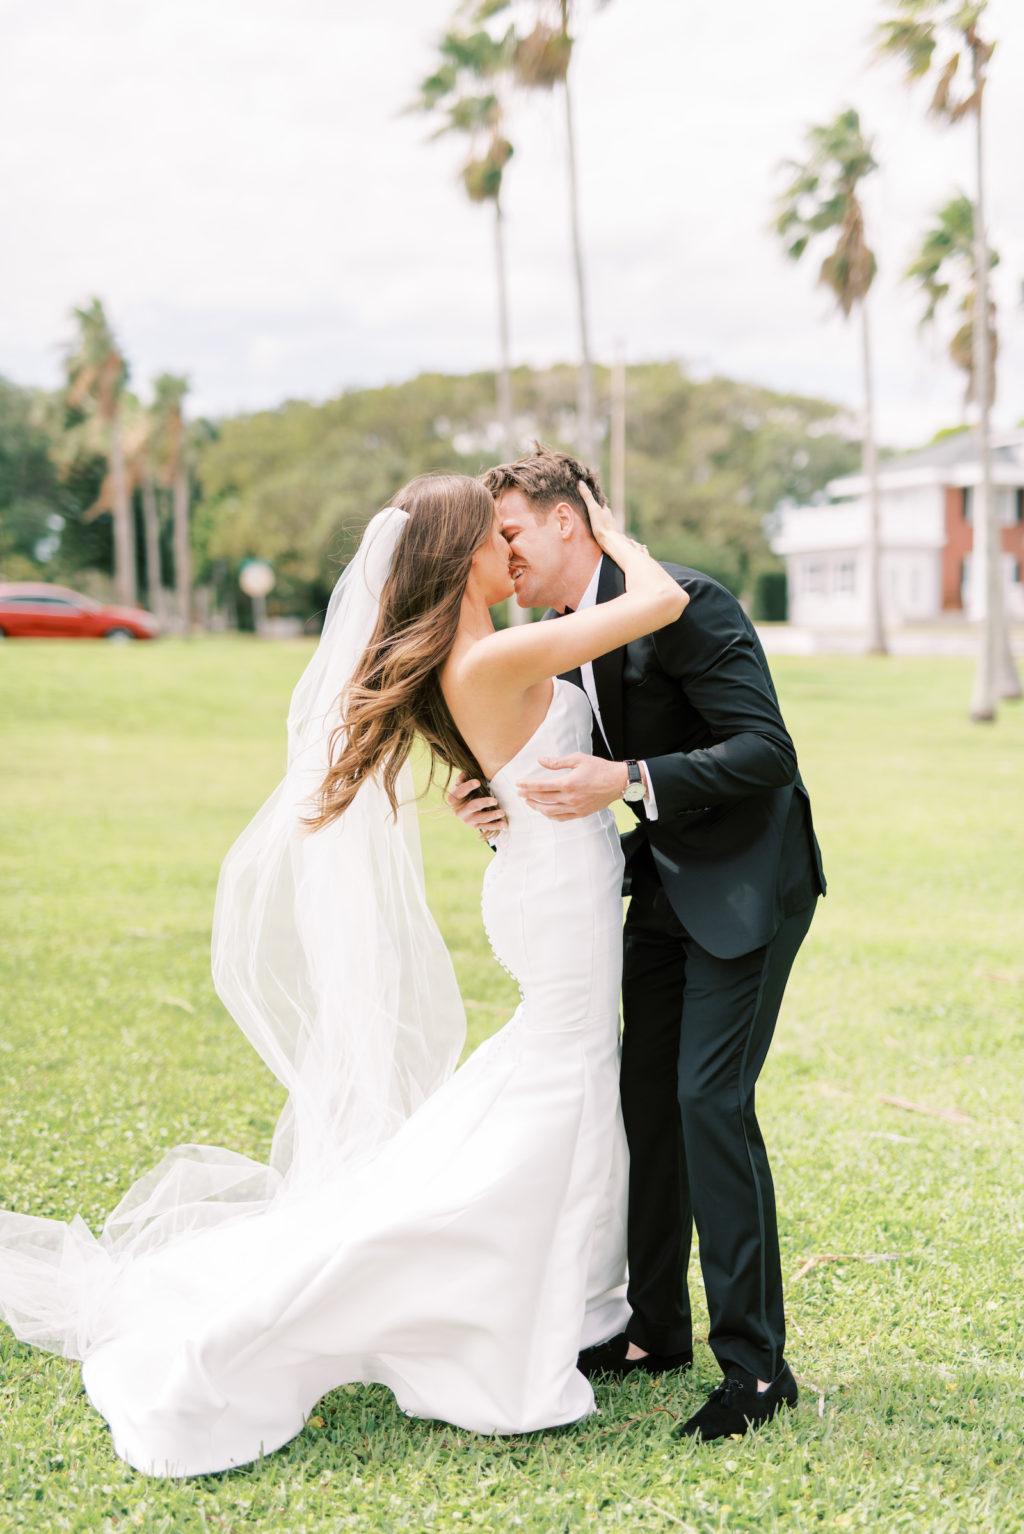 Florida Bride and Groom Outdoor Wedding Photo | Tampa Bay Wedding Photographer Kera Photography | Wedding Hair and Makeup Femme Akoi Beauty Studio